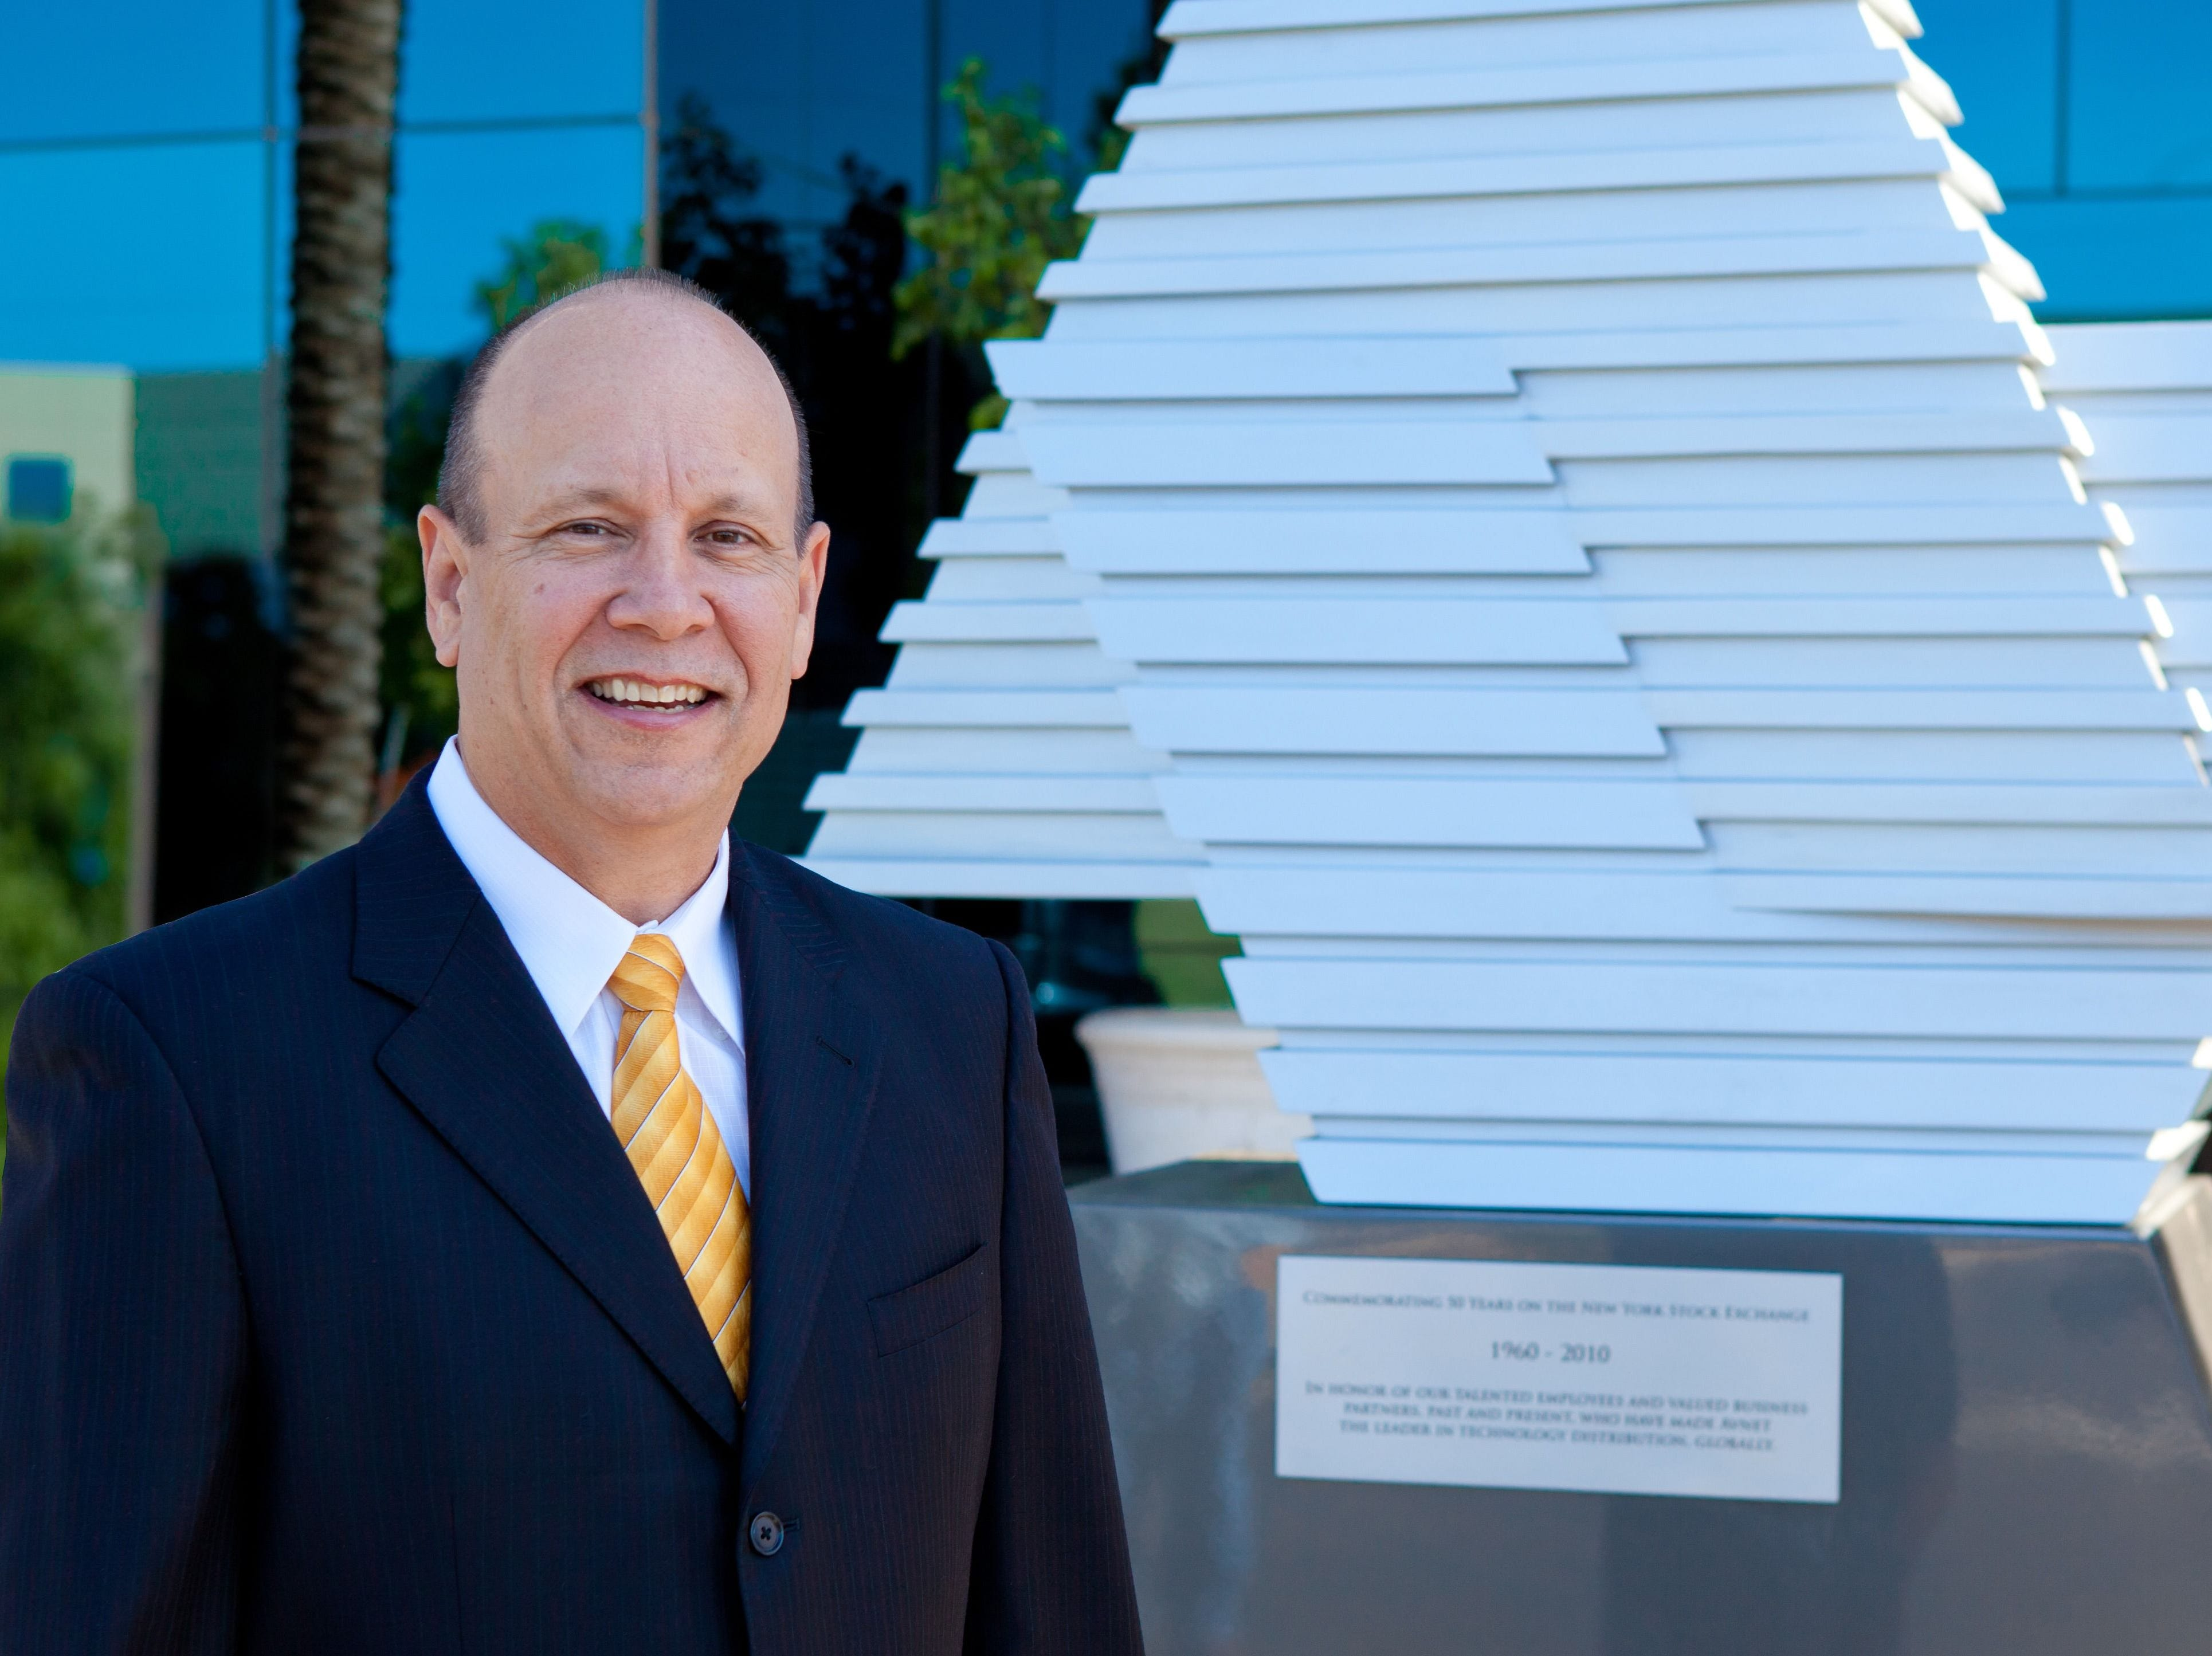 Avnet Inc.'s Richard Hamada (ex-CEO): Summary compensation: $4,356,815. Adjusted compensation: $8,610,170. TTM profit: $134 million. TTM revenue: $18.6 billion. 2017 stock:  (15.3 percent). Capitalization: $5.2 billion.